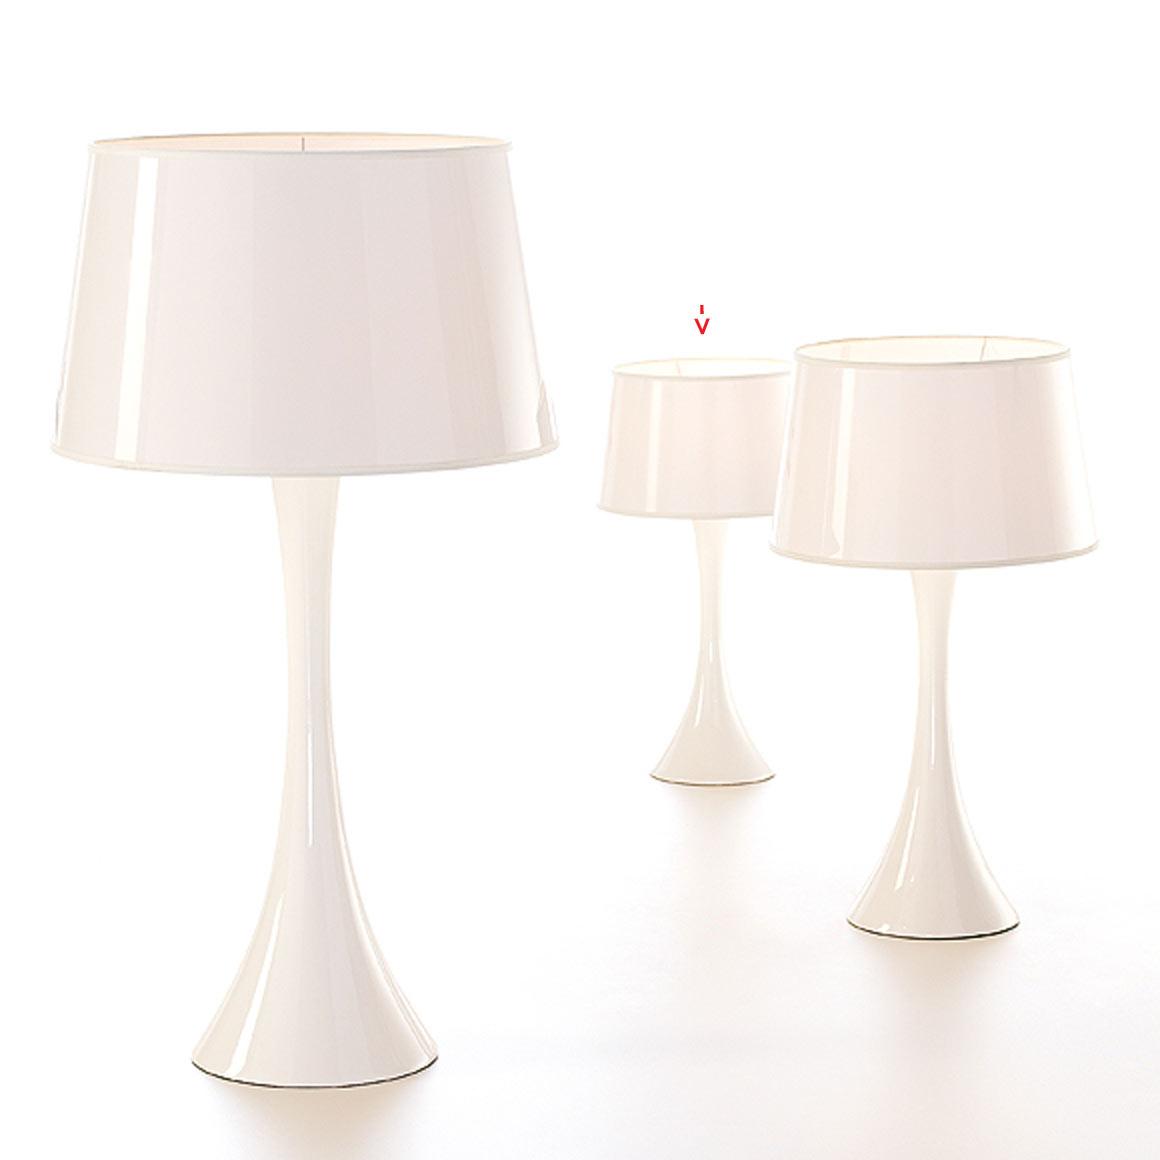 Conic Gloss Branco lampe PM. Paulo Coelho.